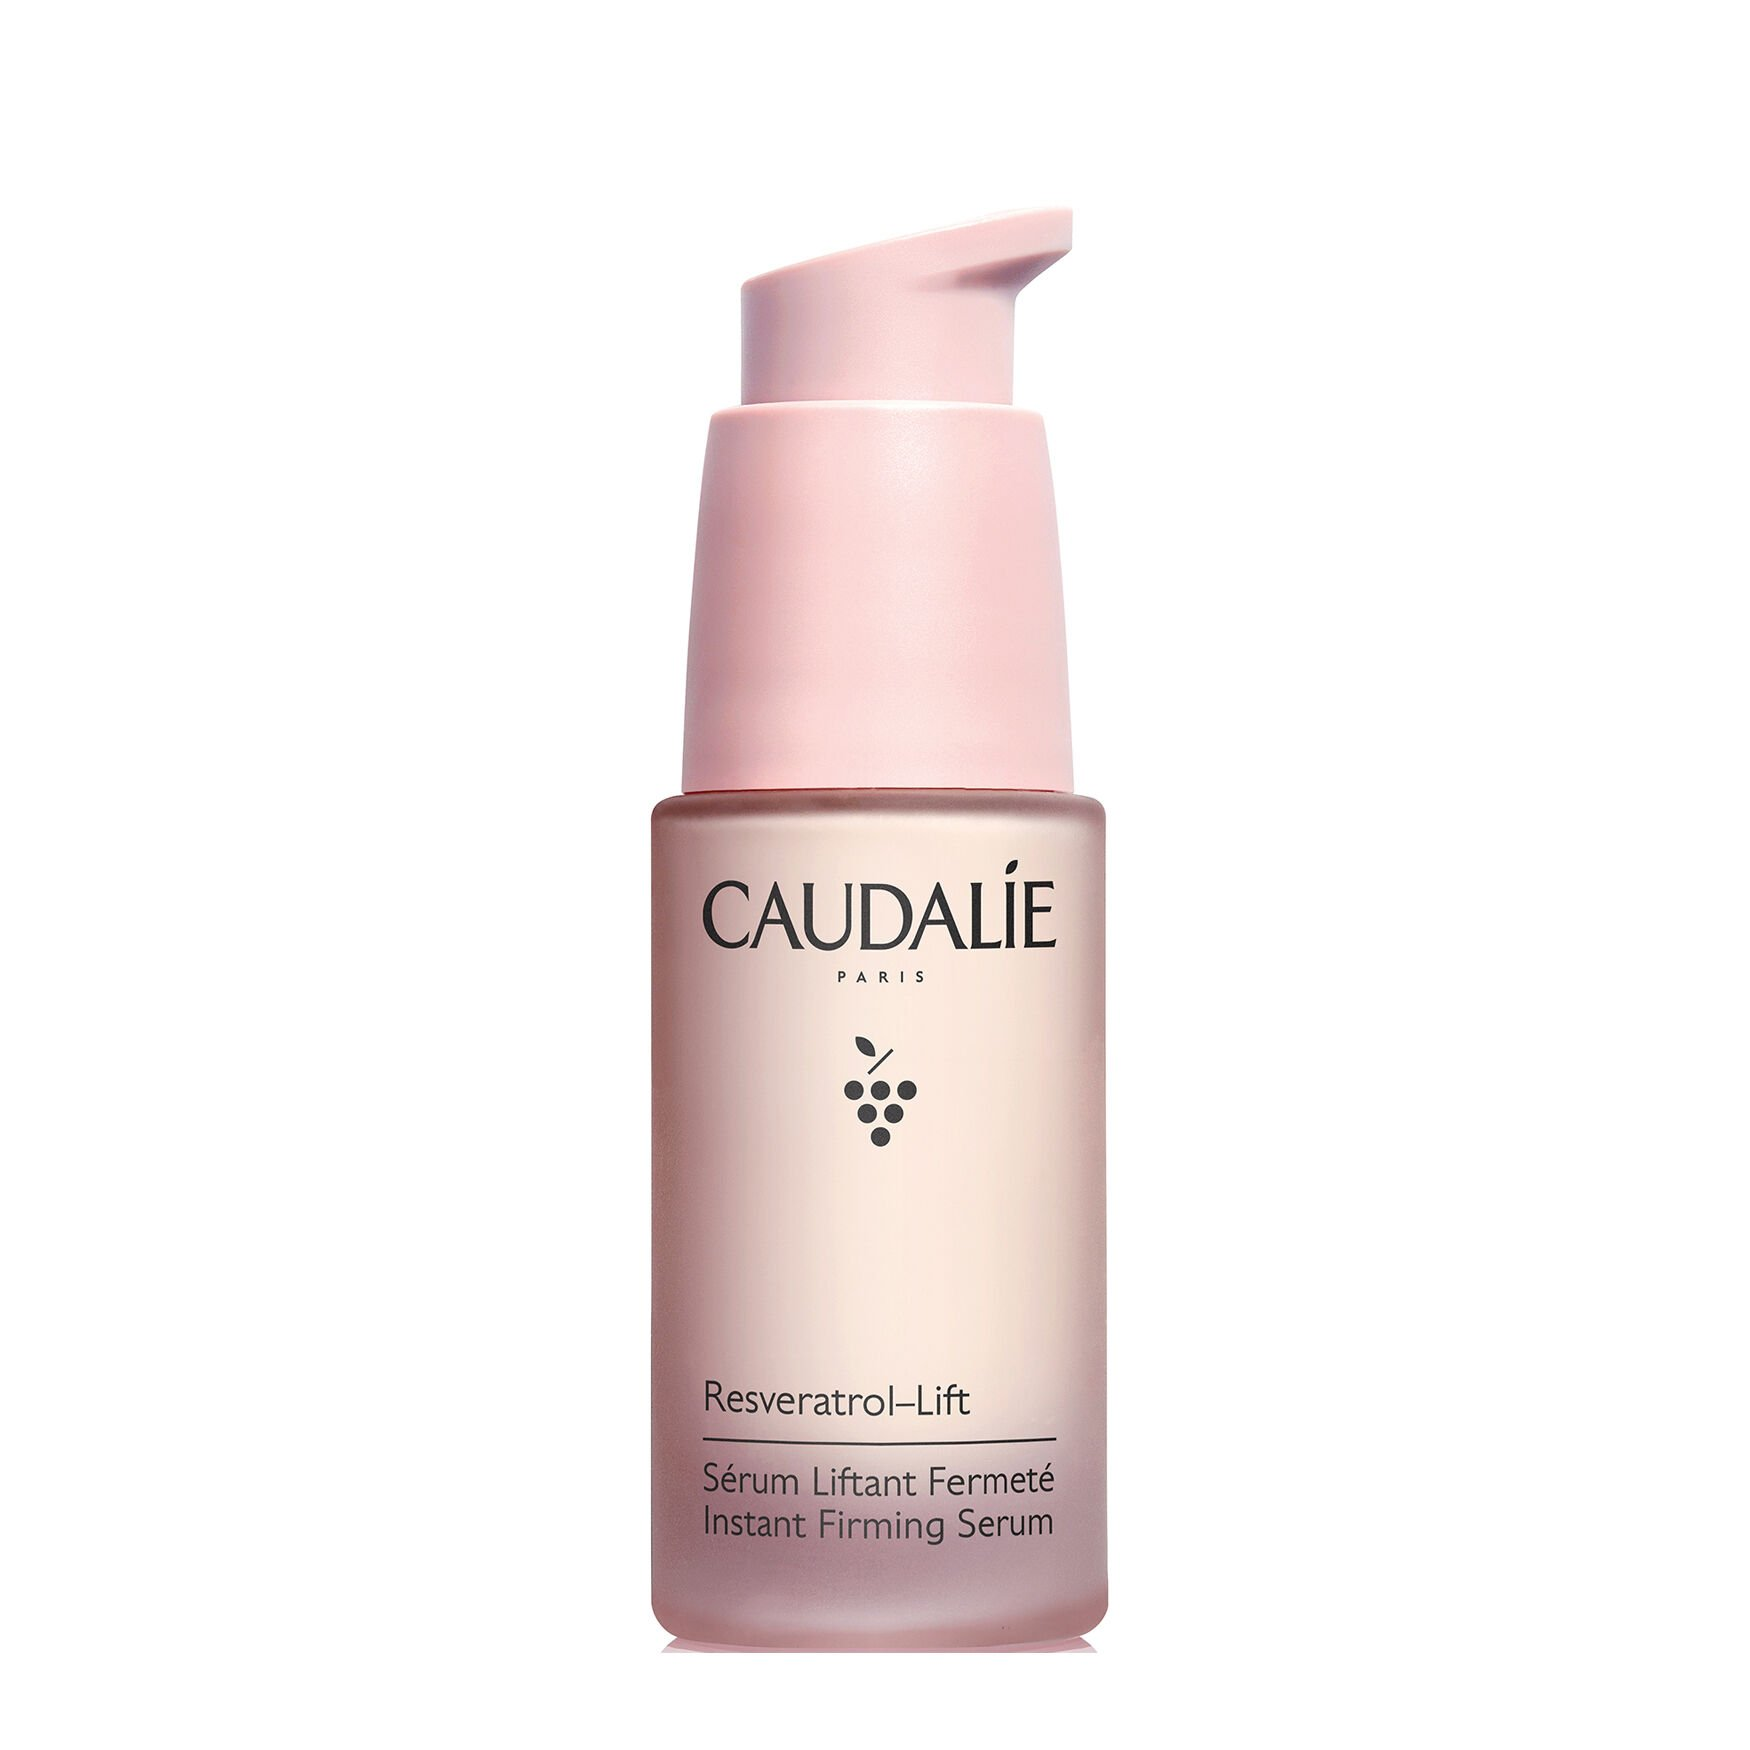 Caudalie - Resvératrol Firming Serum 30 ml